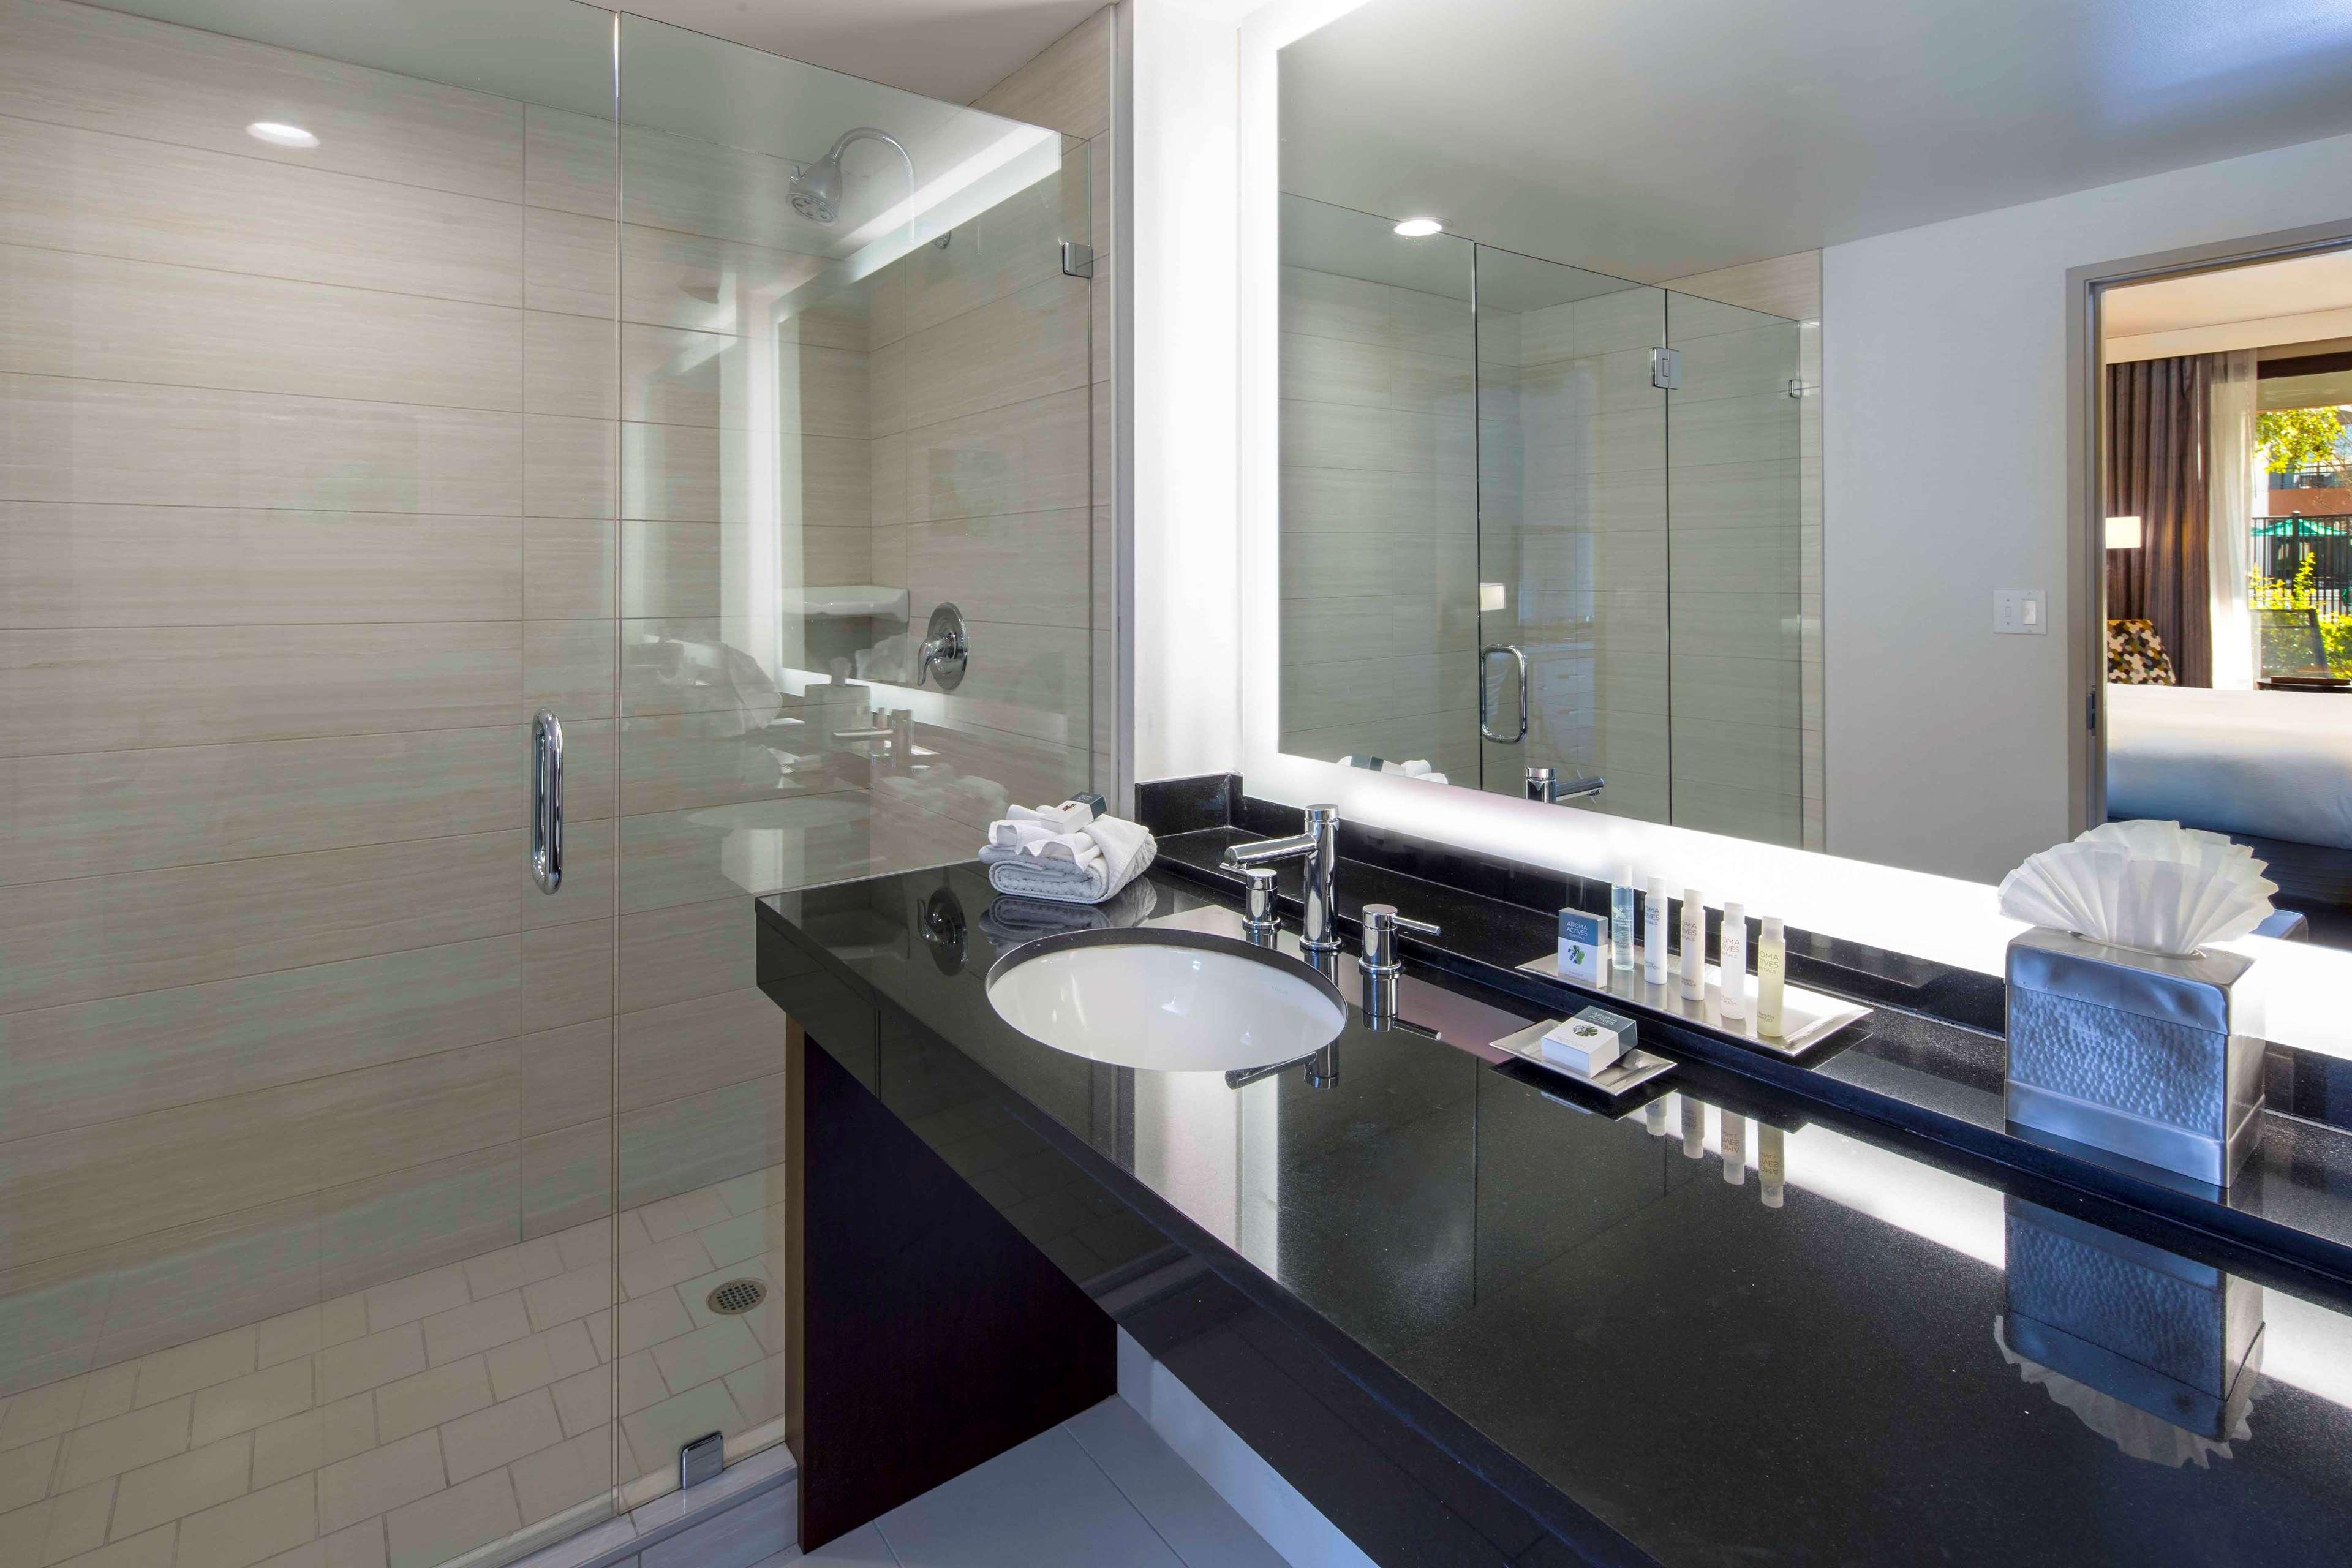 DoubleTree by Hilton Hotel Newark - Fremont image 21